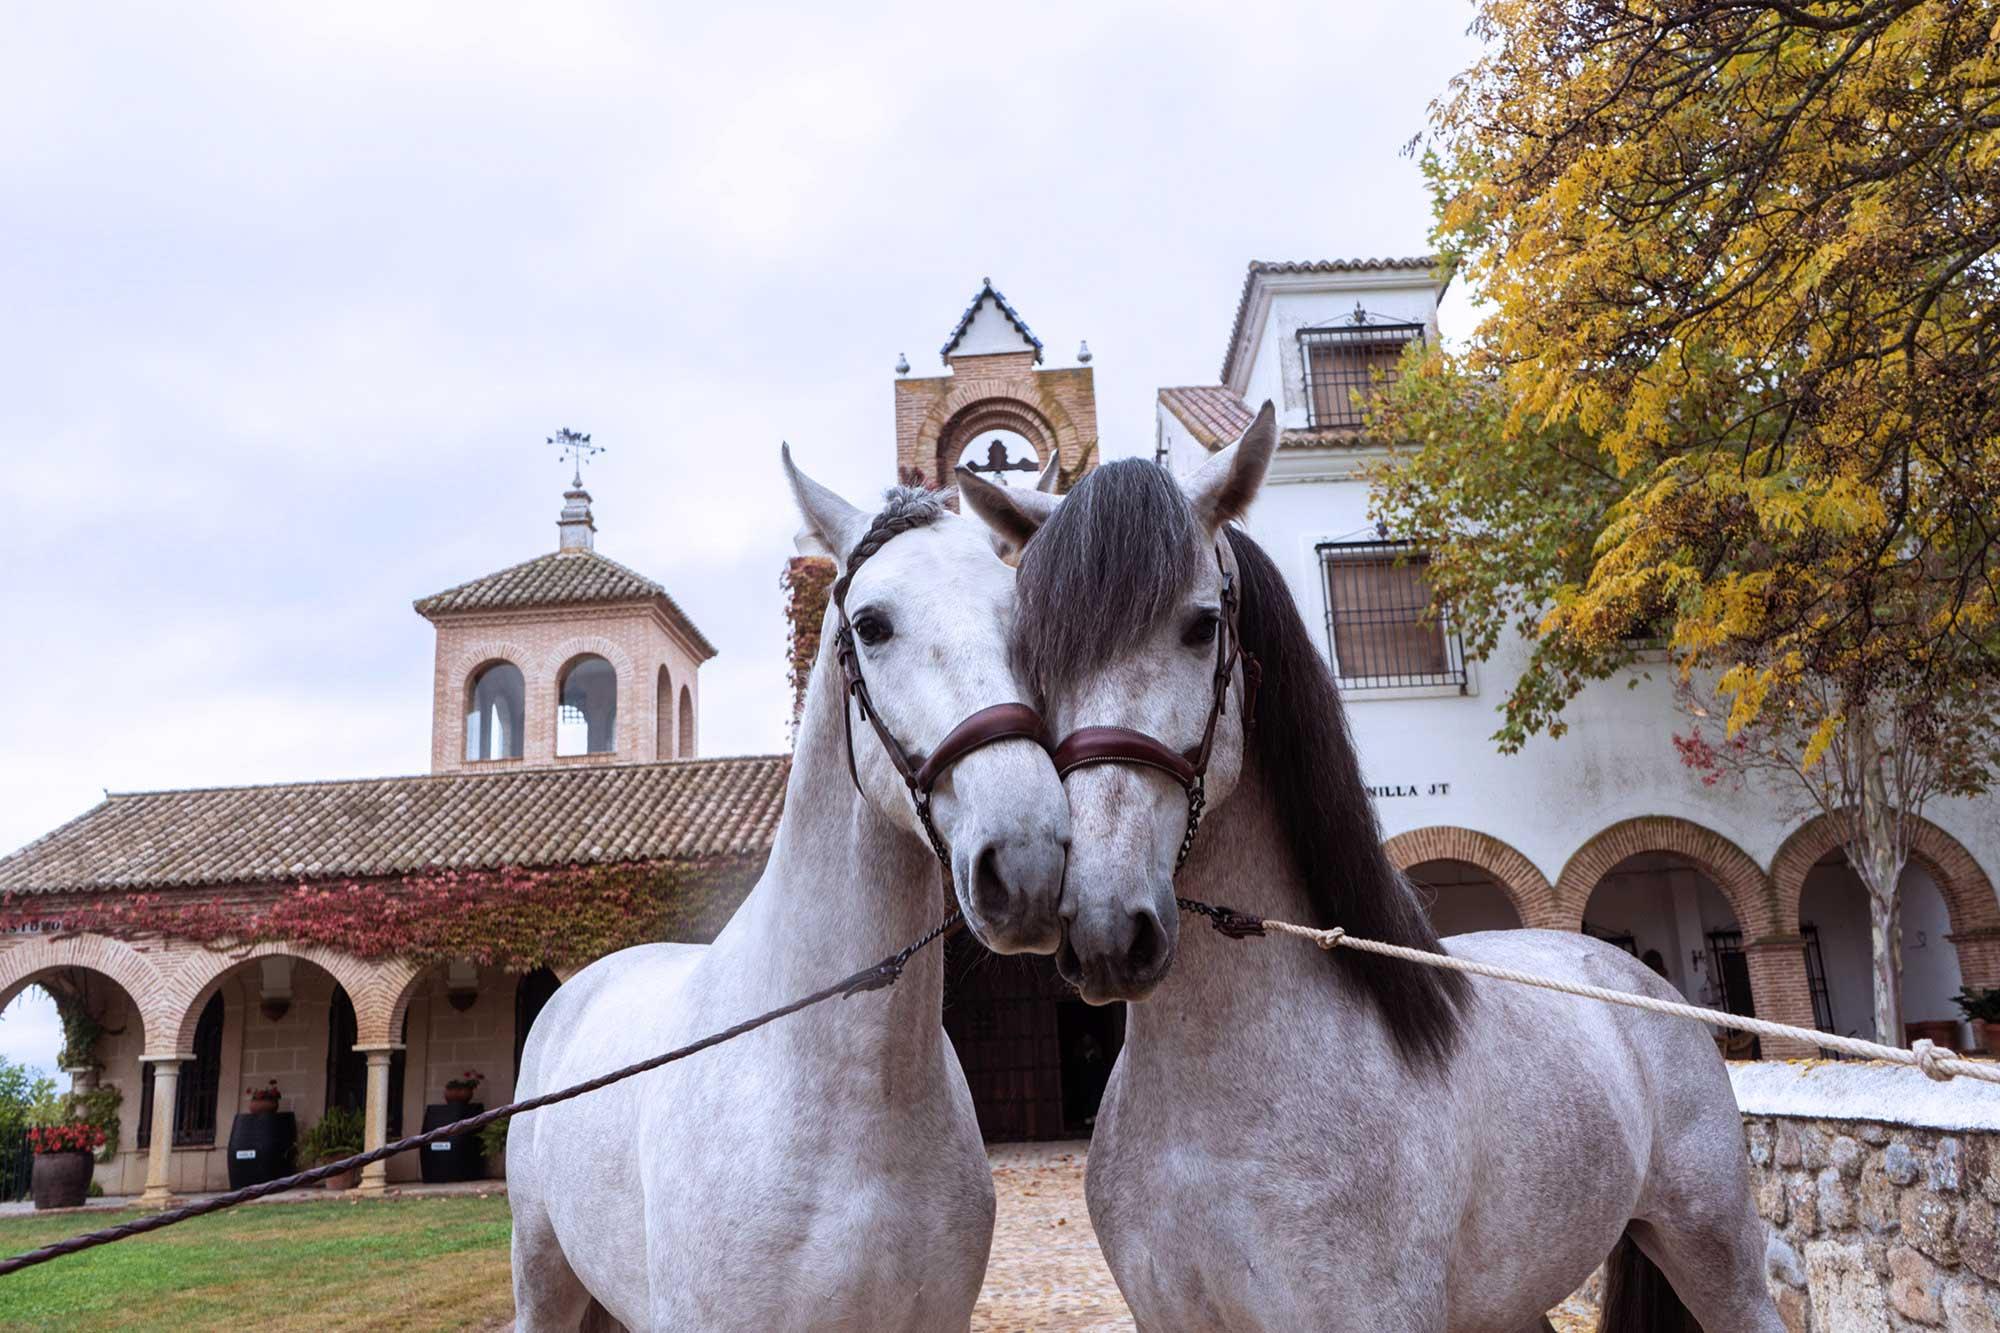 enoturismo-caballos-pura-raza-bodegas-habla-2